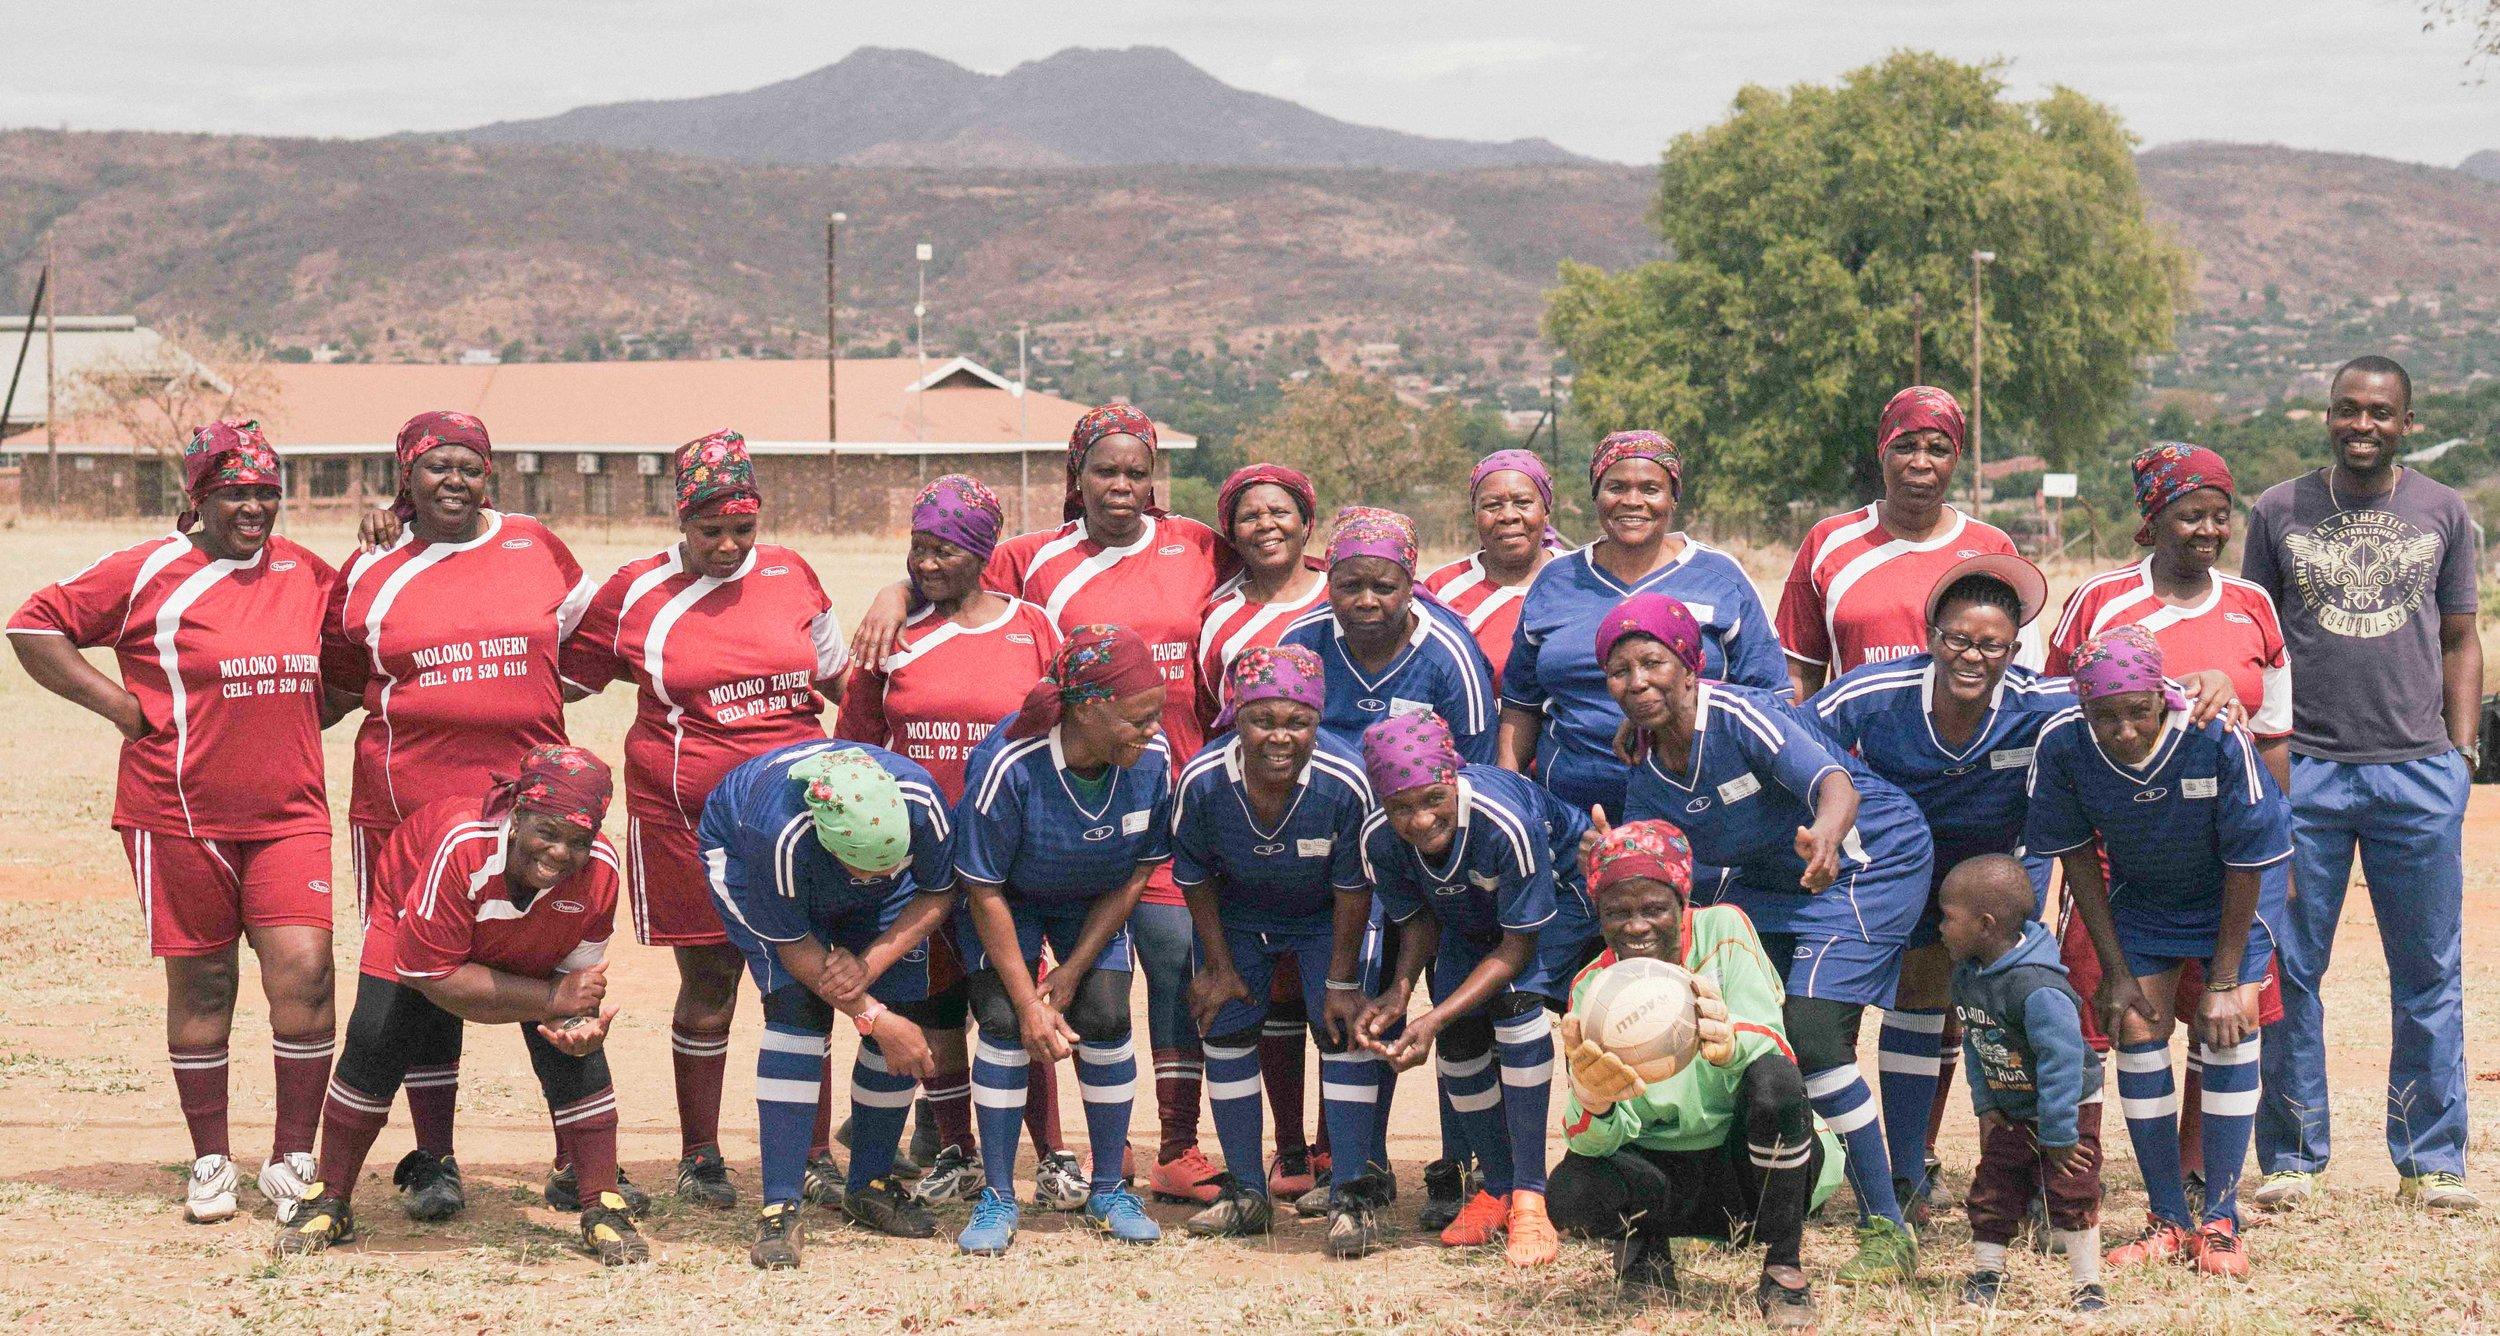 En Octobre 2018, Oldyssey rencontrait l'équipe nationale sud-africaine de femmes âgées, Vakhegula Vakhegula